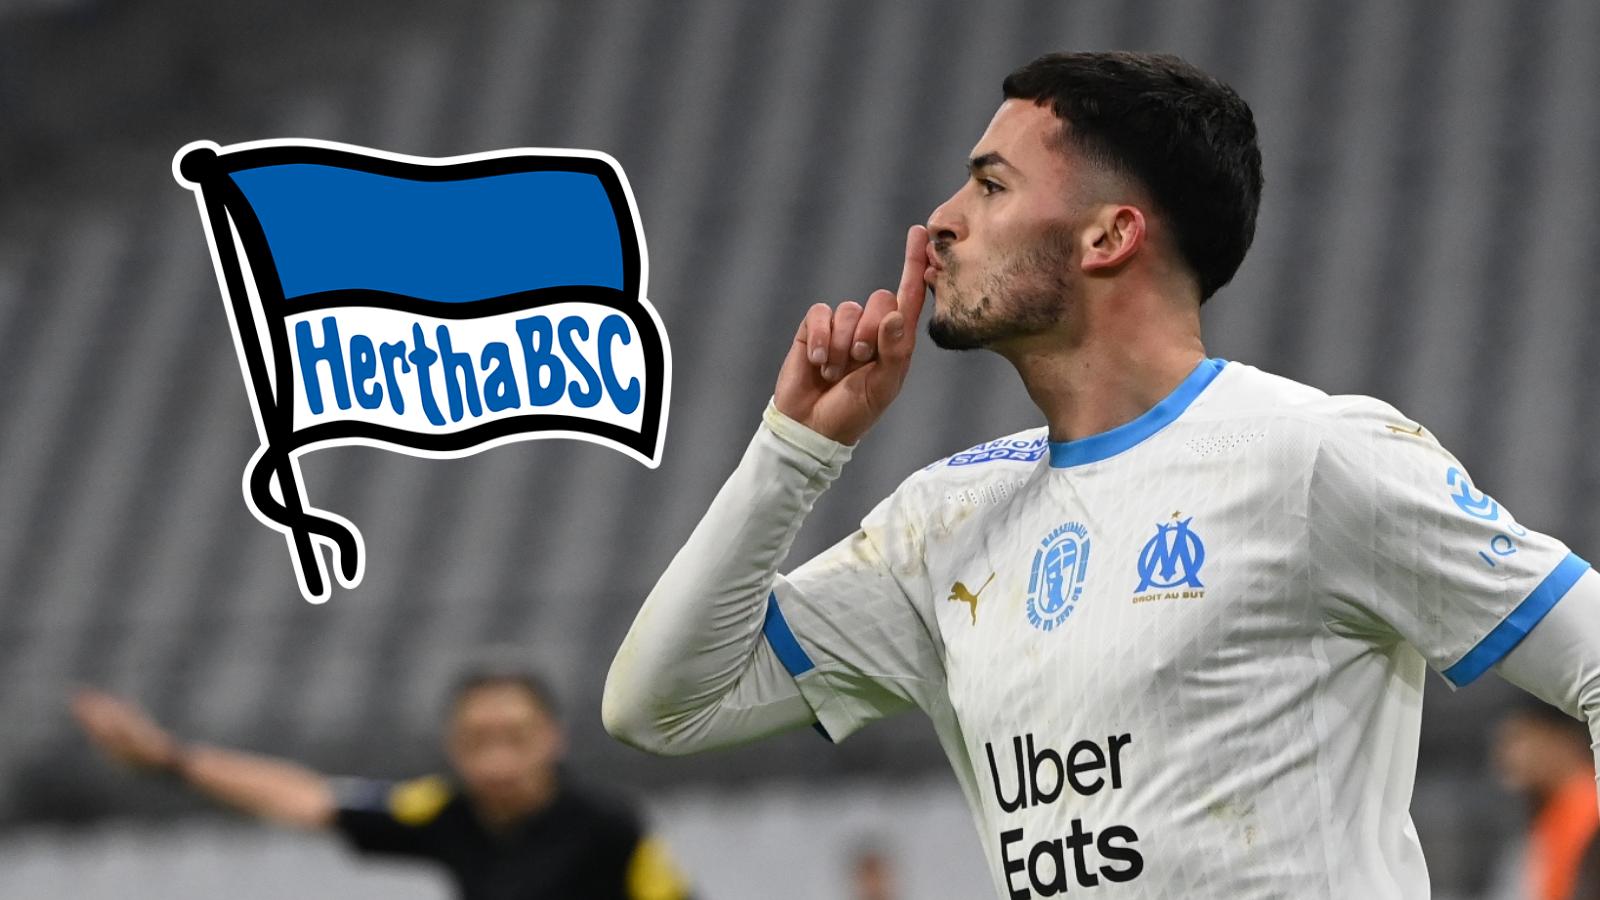 Nemanja Radonjic (OM) et Sami Khedira (Juventus) au Hertha Berlin (officiel) — Transferts